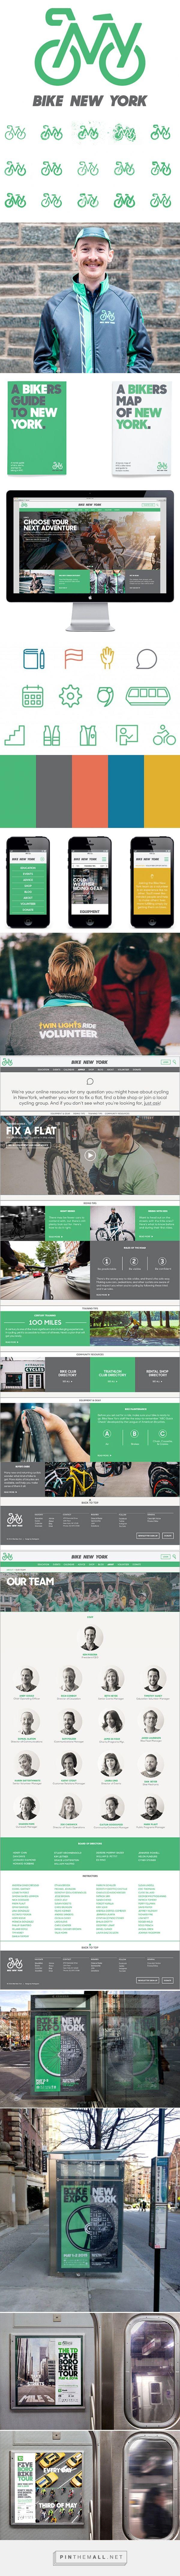 New Work: Bike New York | New at Pentagram - created via http://pinthemall.net #branding